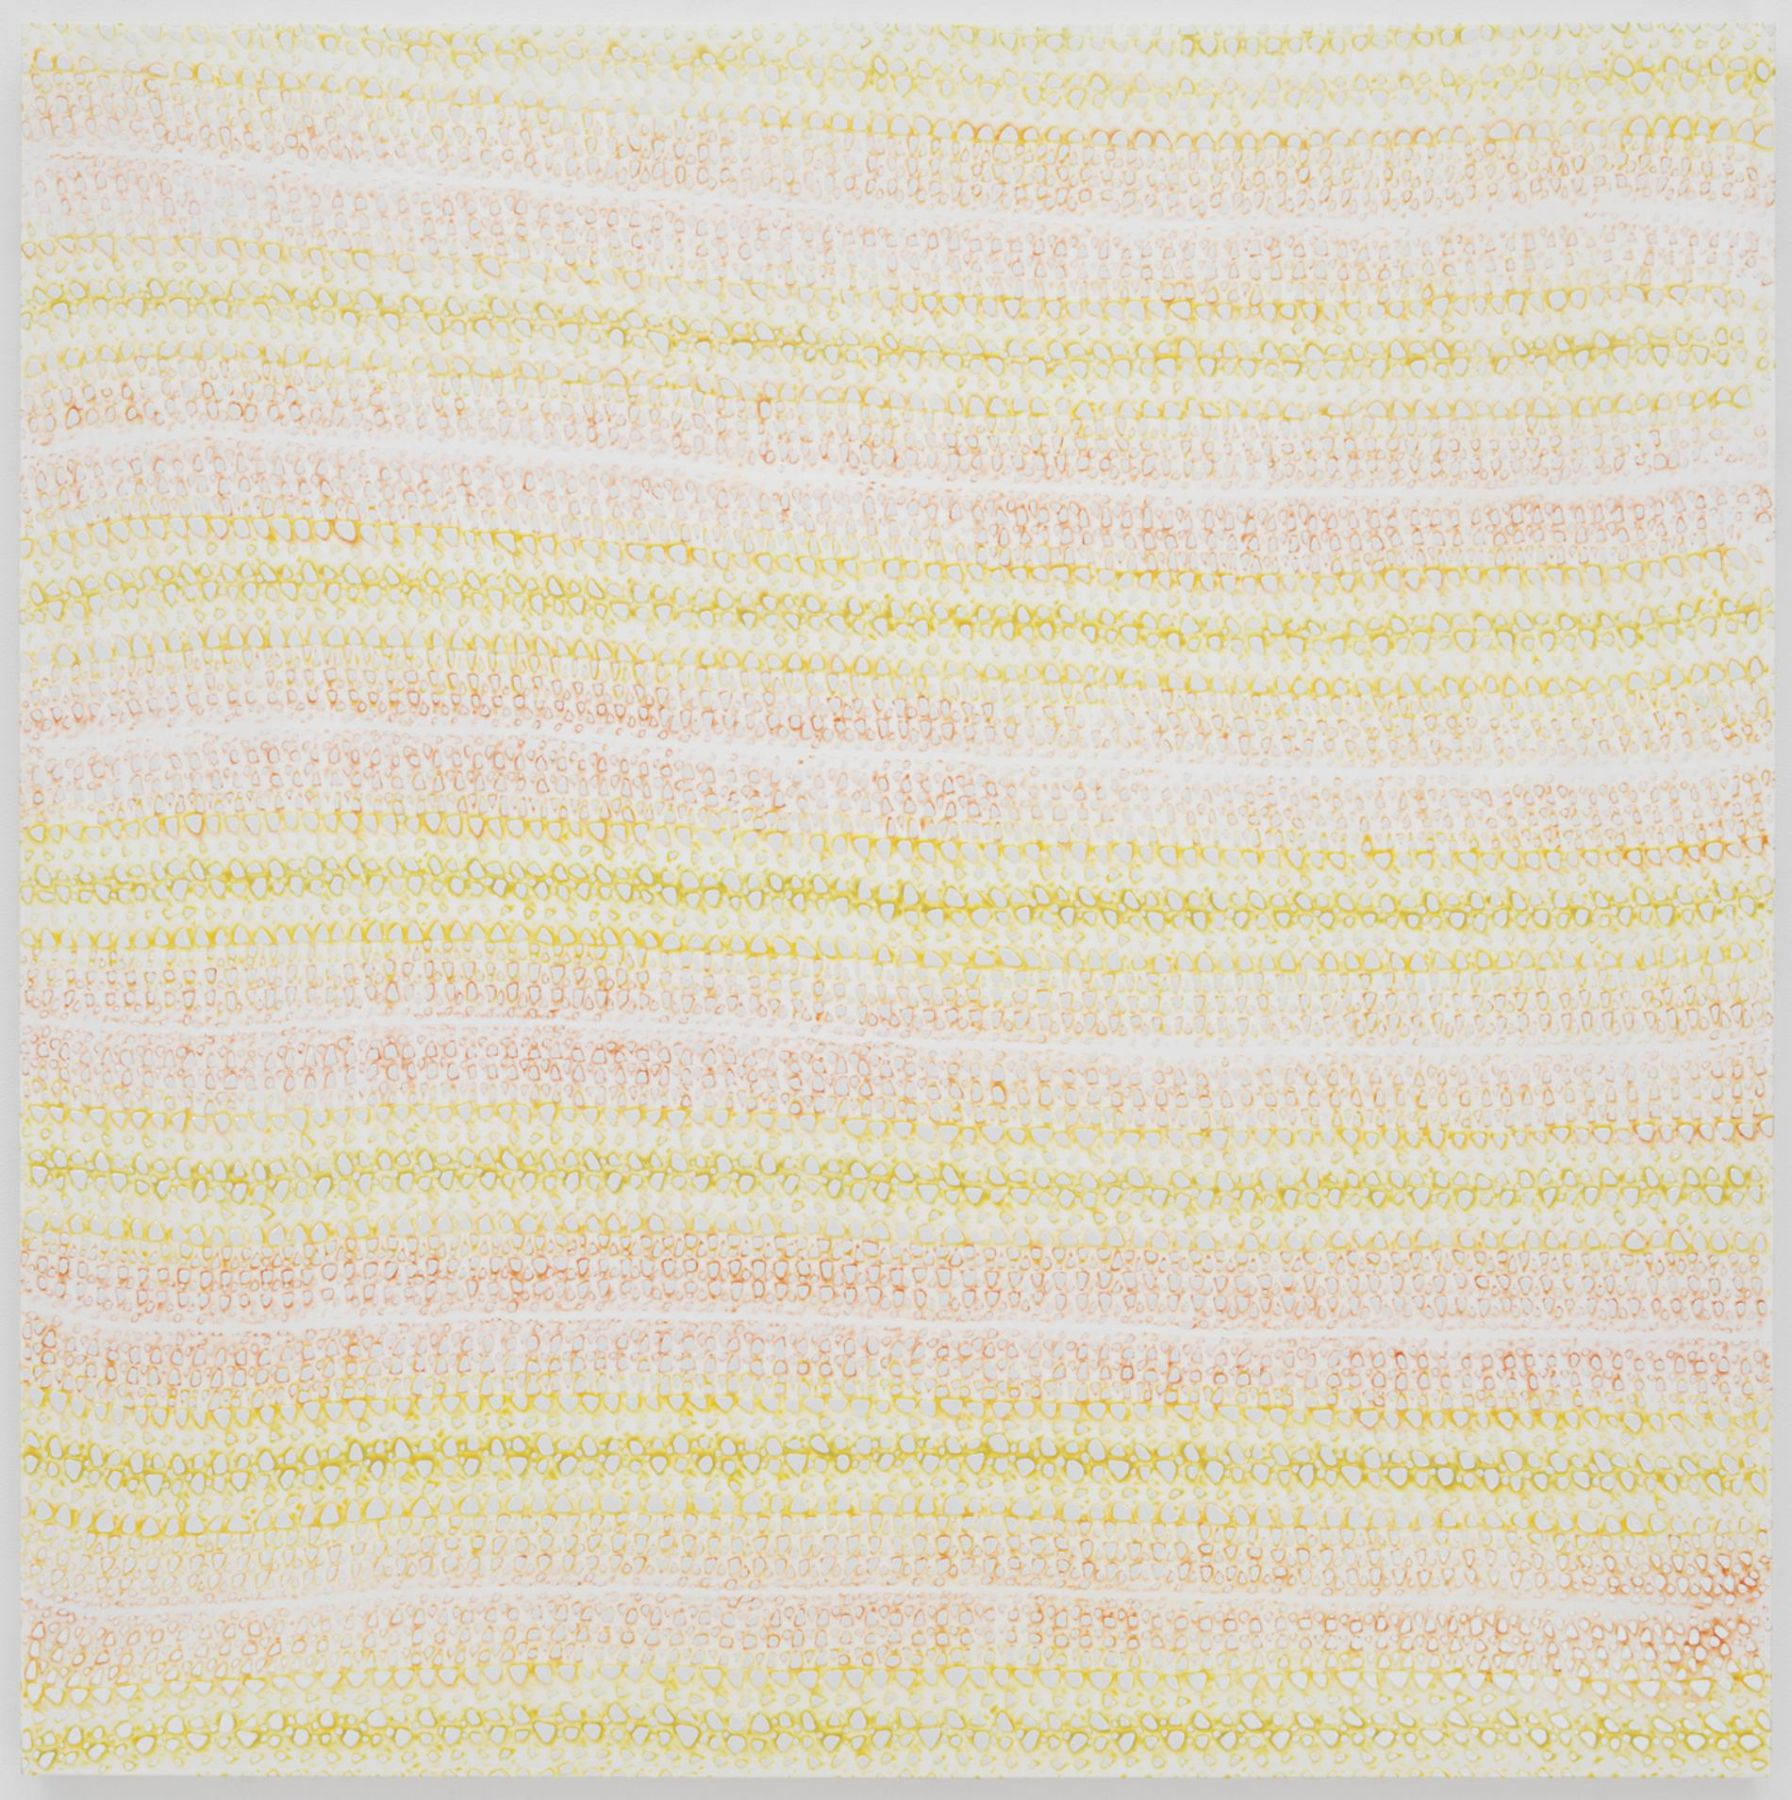 , MICHELLE GRABNERUntitled,2014Enamel on panel60 x 60 x 1 1/2 in. (152.4 x 152.4 x 3.8 cm)